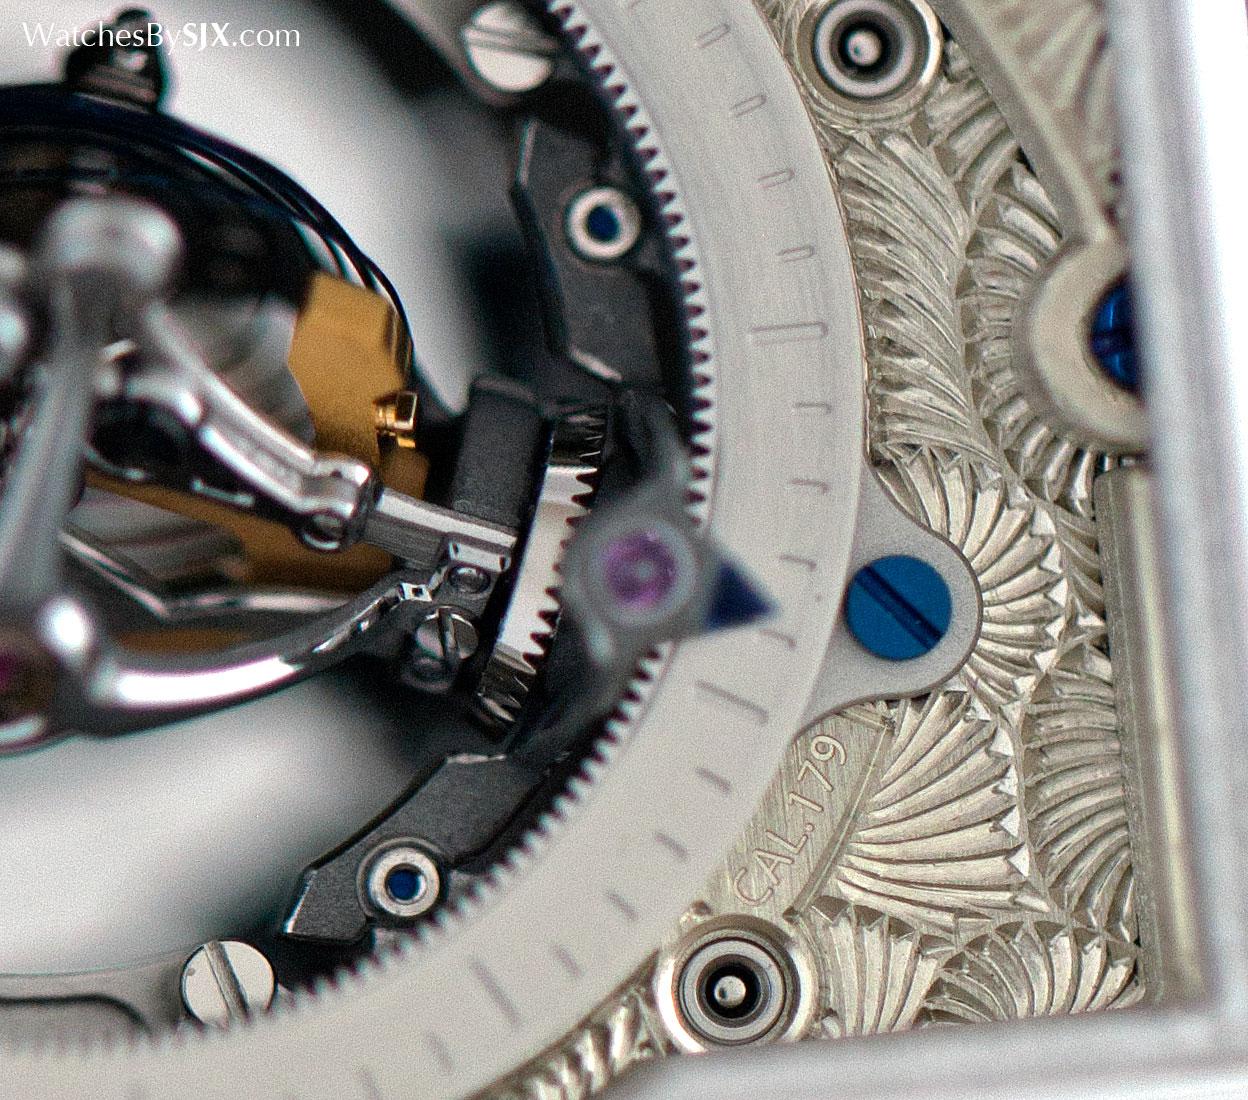 Jaeger-LeCoultre Reverso Tribute Gyrotourbillon platinum 19